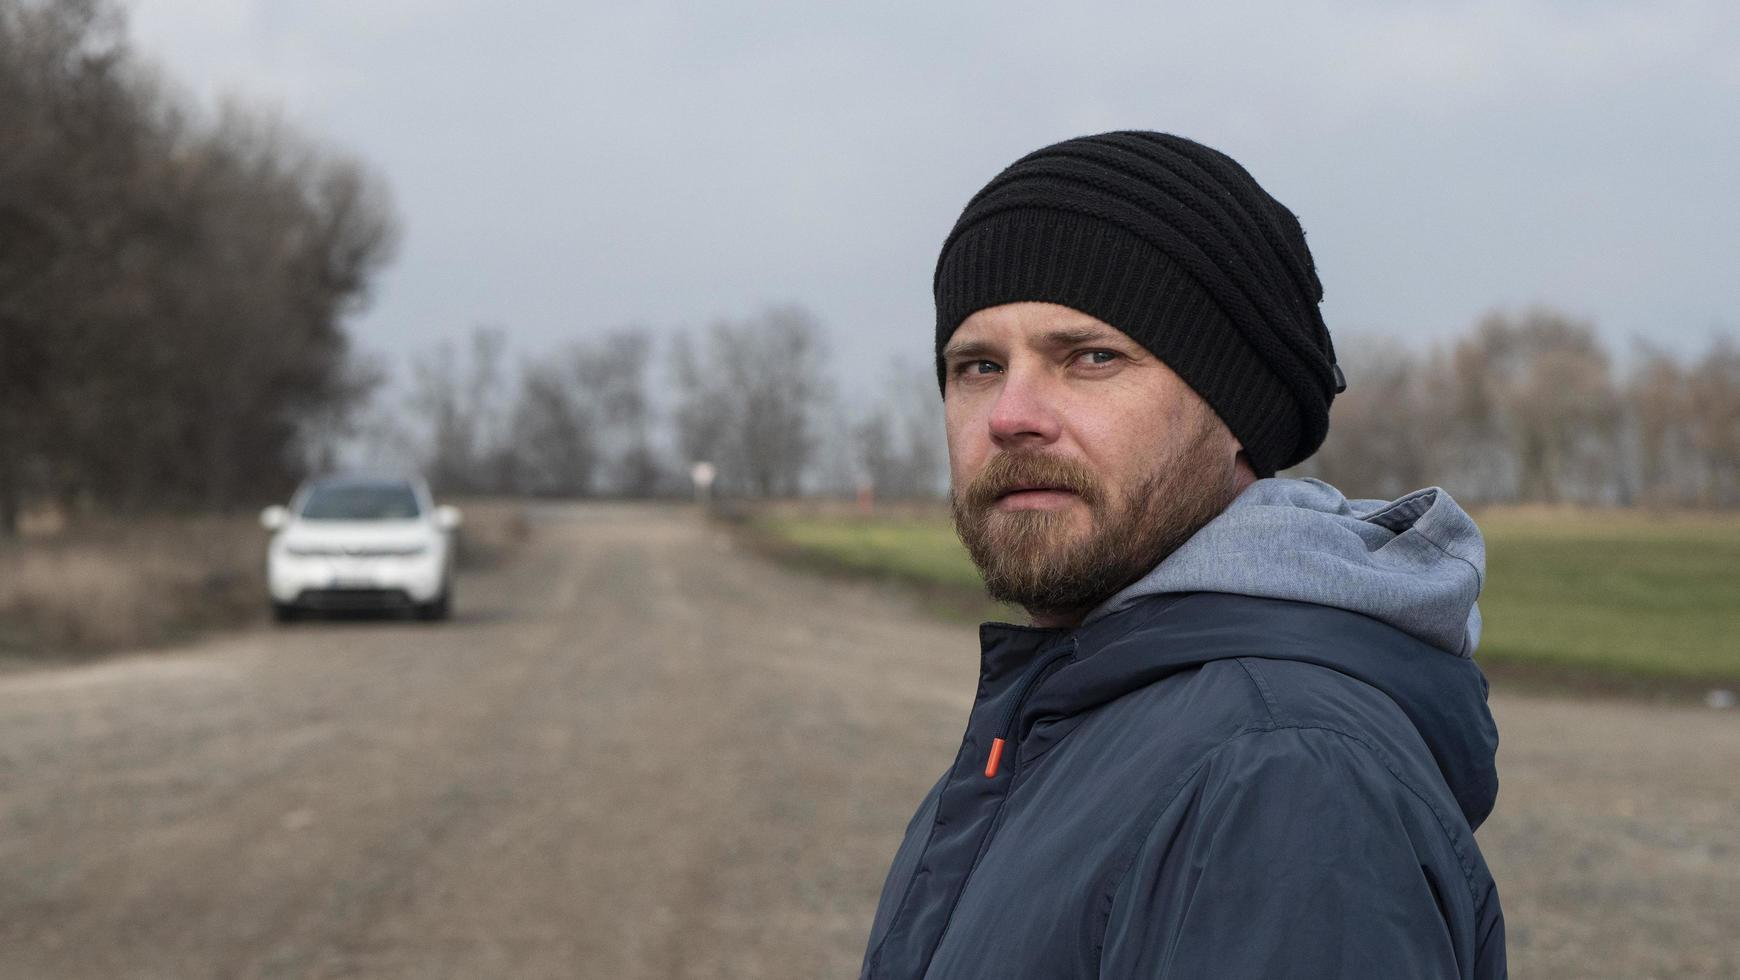 A man on a dirt road photo